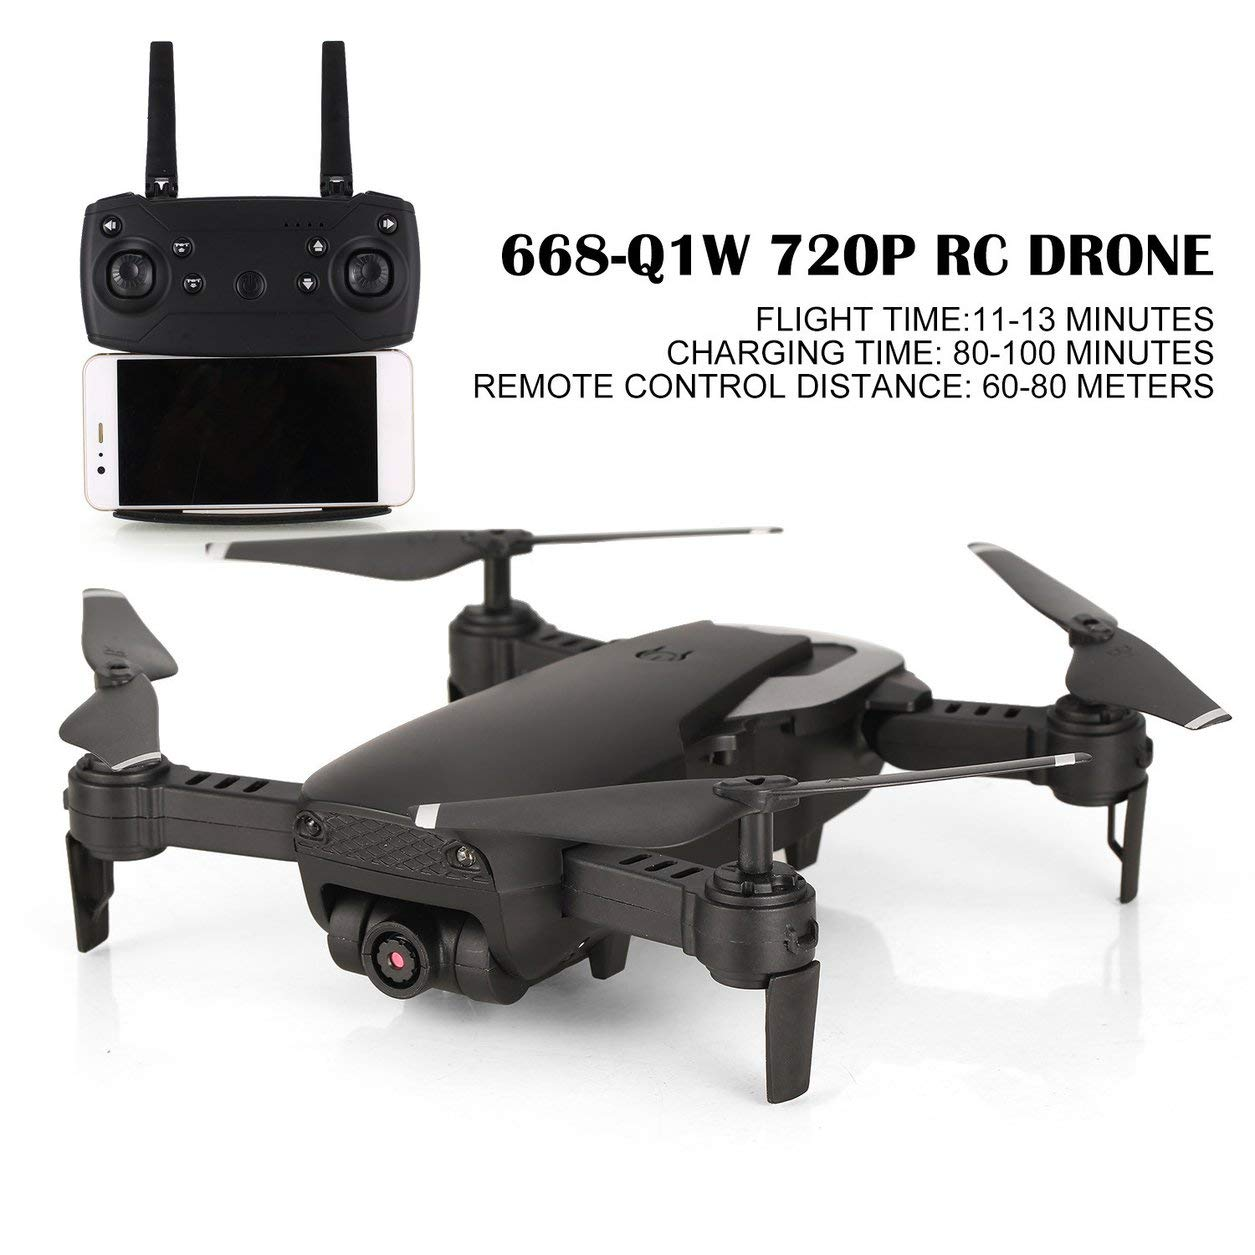 Dailyinshop 668-Q1W 720P RC Drone Quadcopter mit HD-Kamera Altitude Hold Hubschrauber